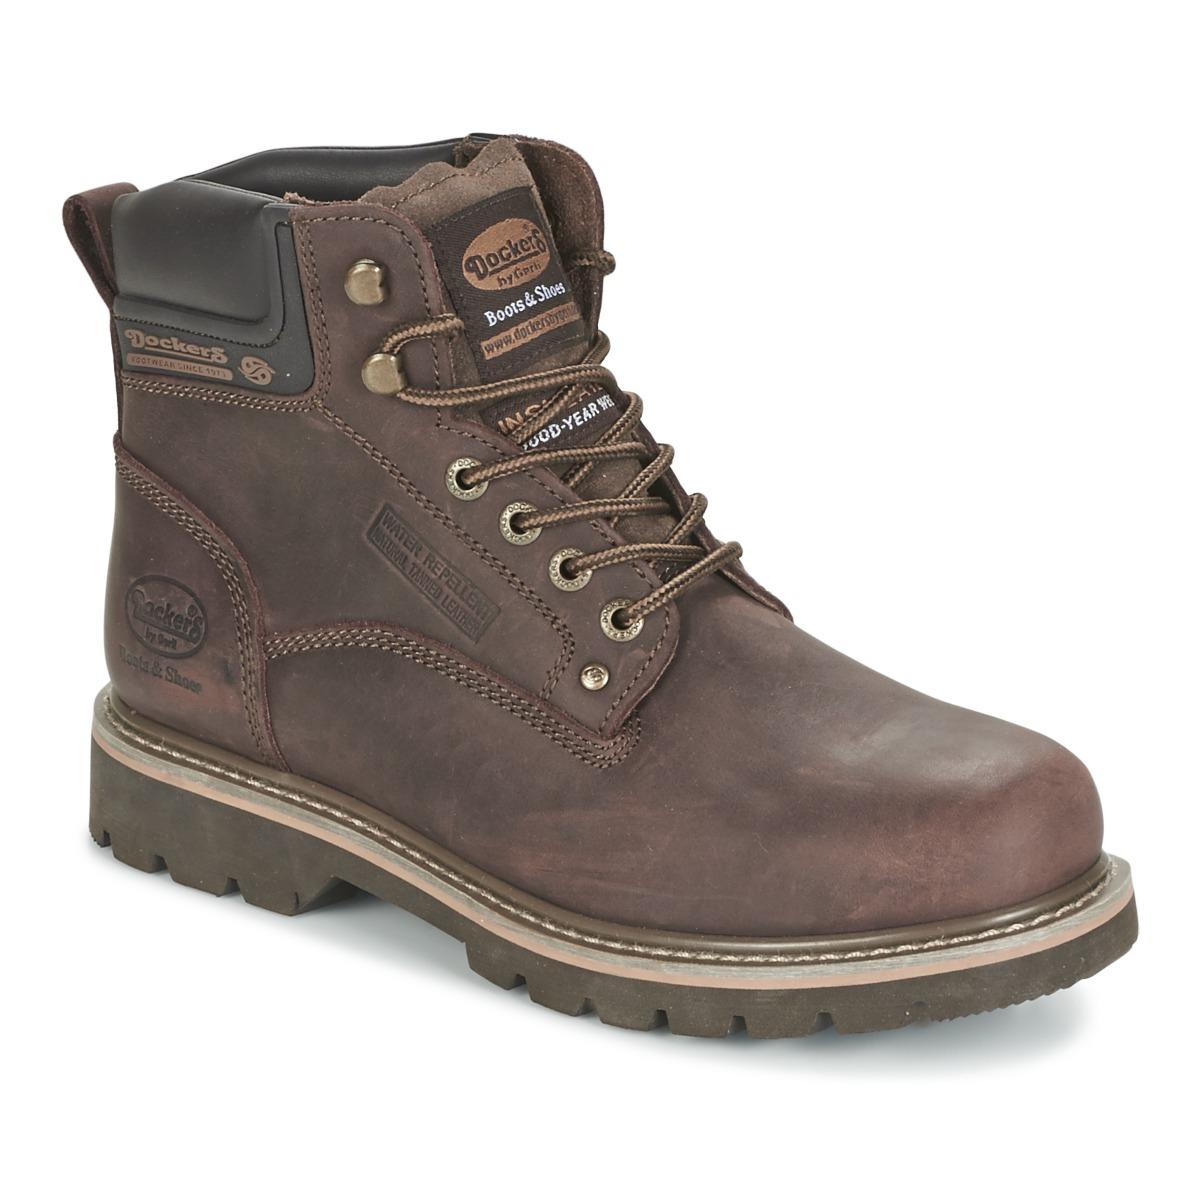 Dockers by Gerli IRETOK Kaffee - Kostenloser Versand bei Spartoode ! - Schuhe Boots Herren 89,95 €